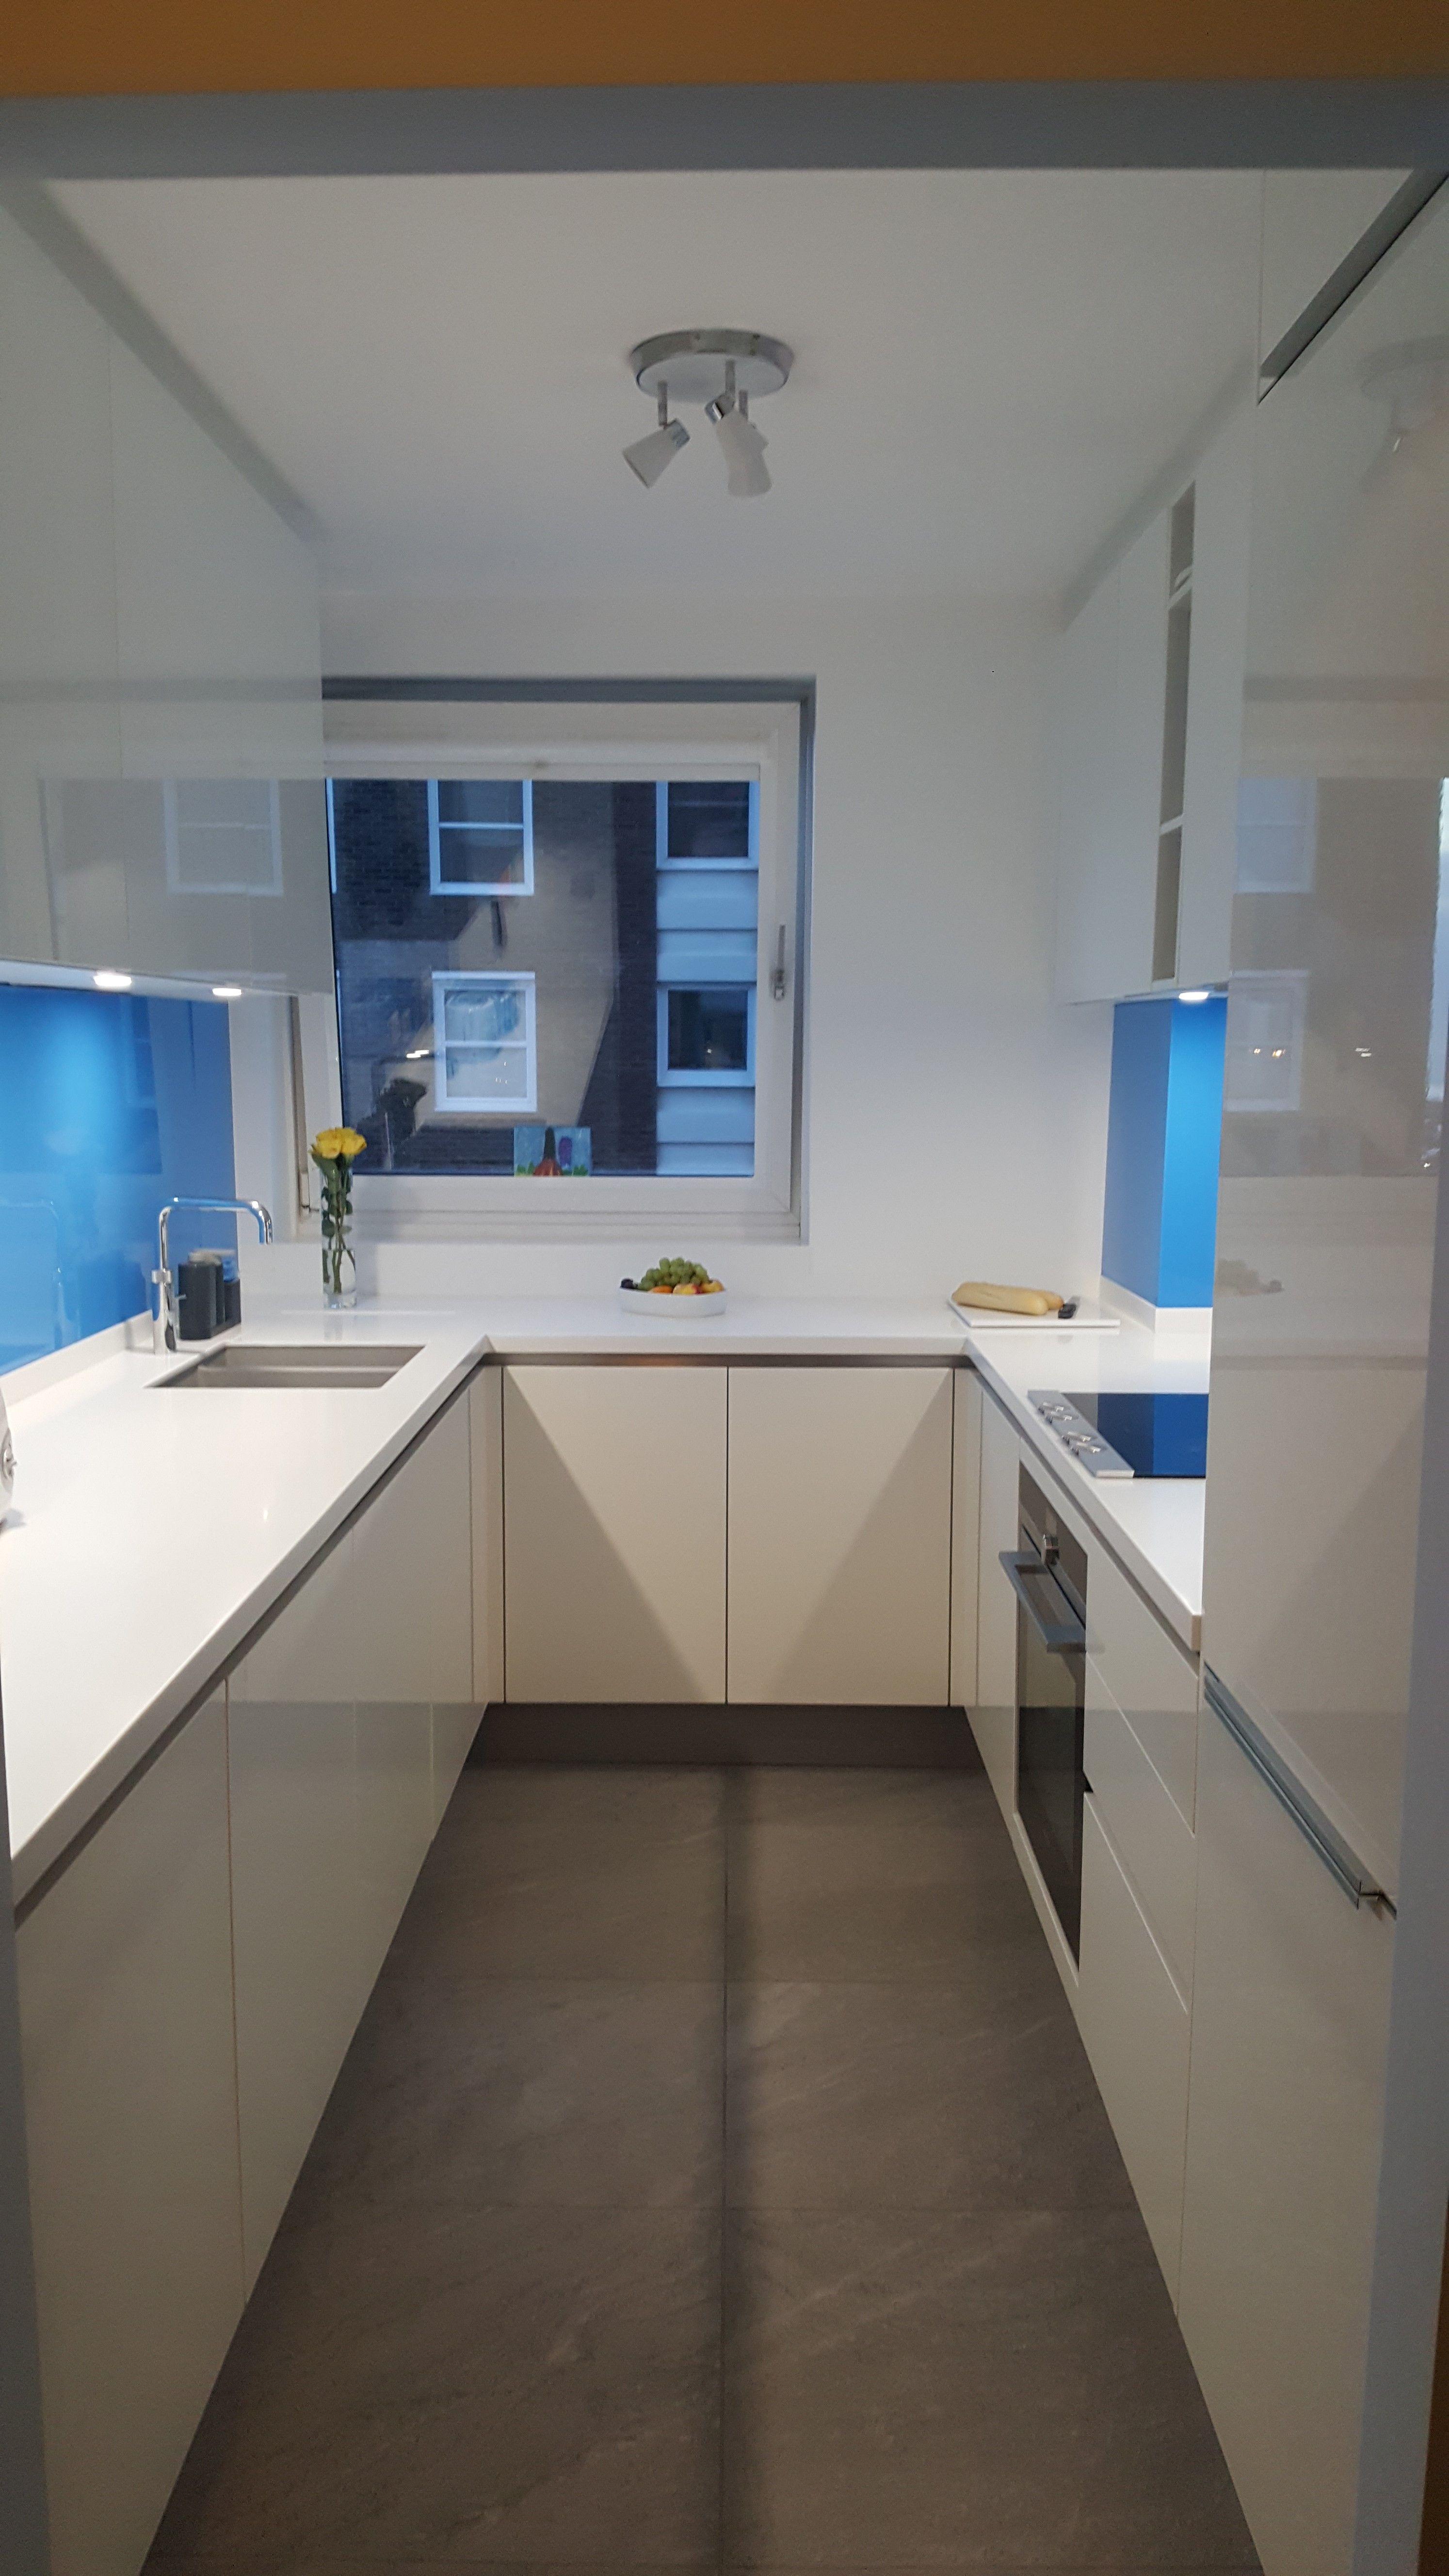 A Striking White On Kitchen With Vibrant Blue Gl Splashback Finished Glacier Corian Worktops German Kitchens Dupont